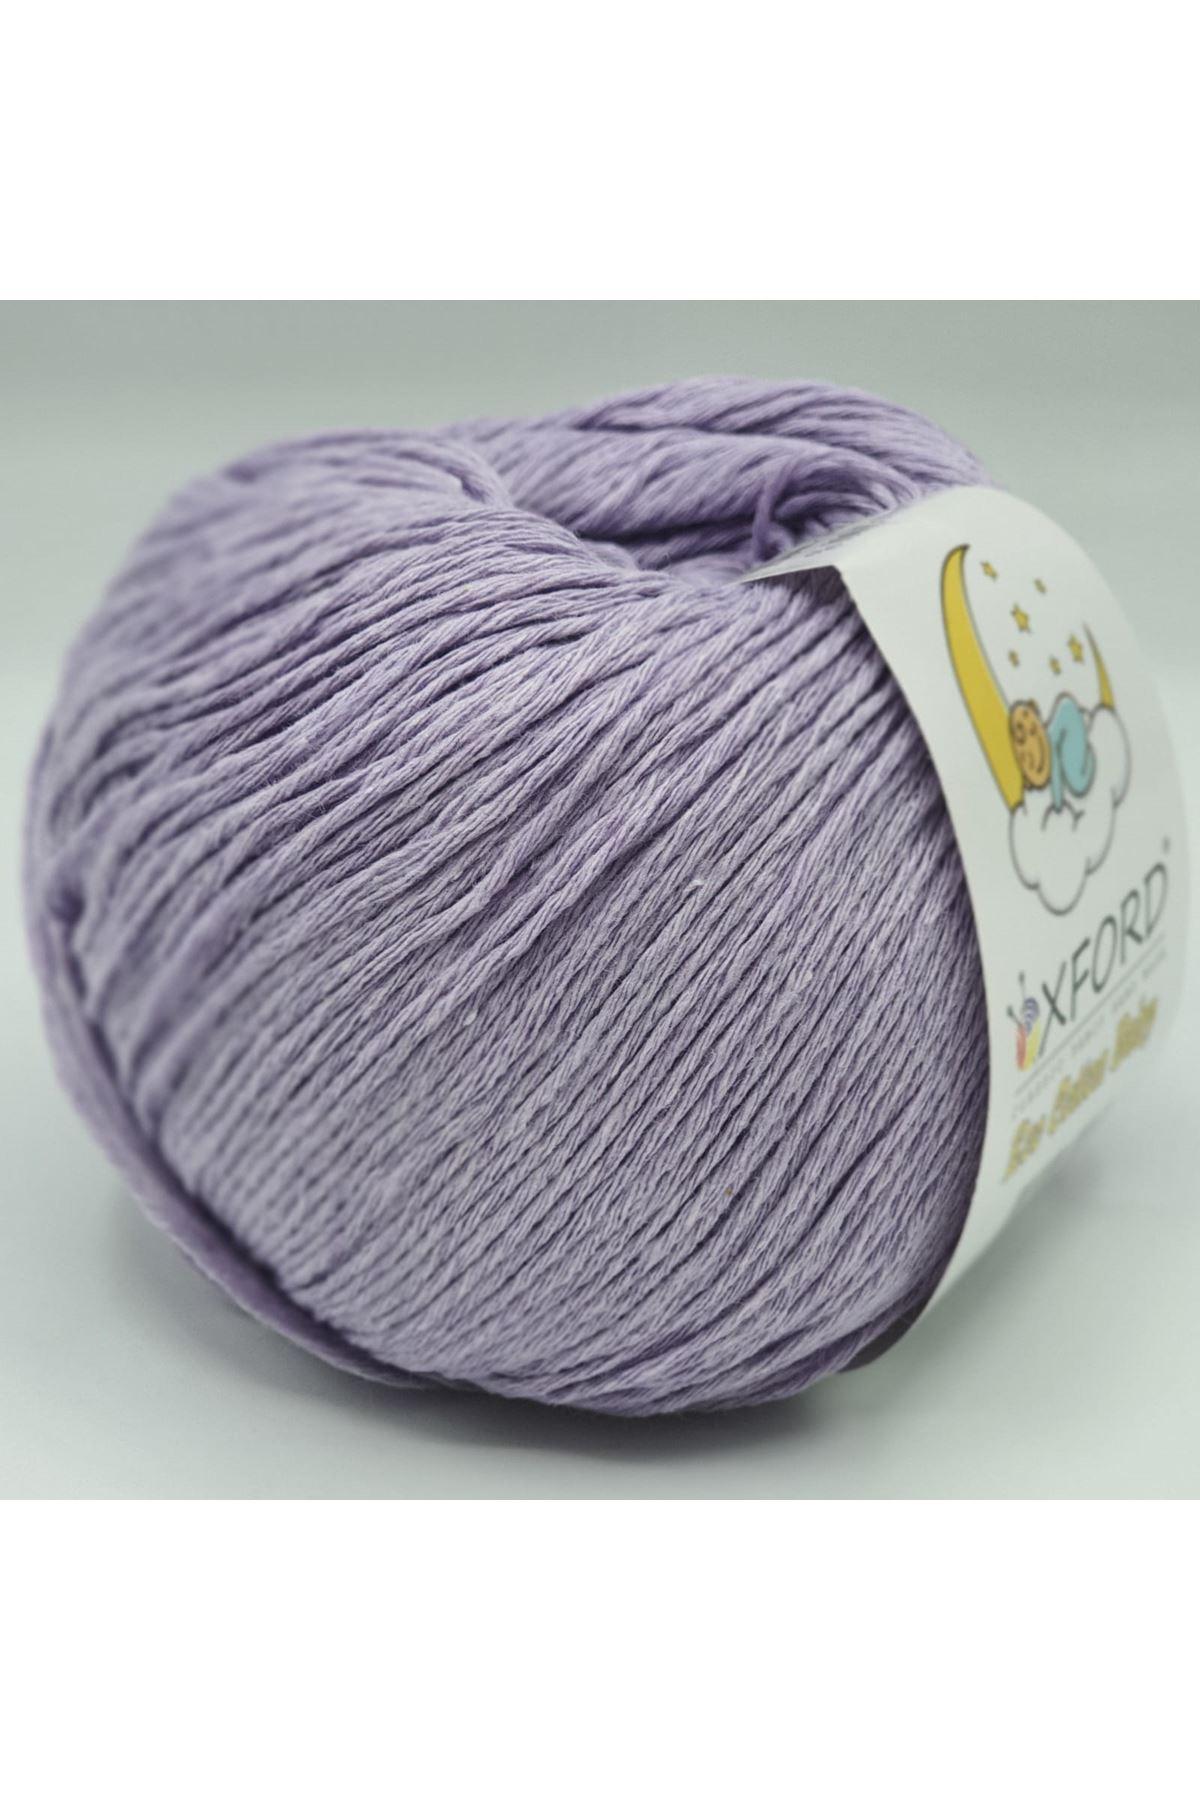 Eco Cotton Baby - 290 Koyu Leylak